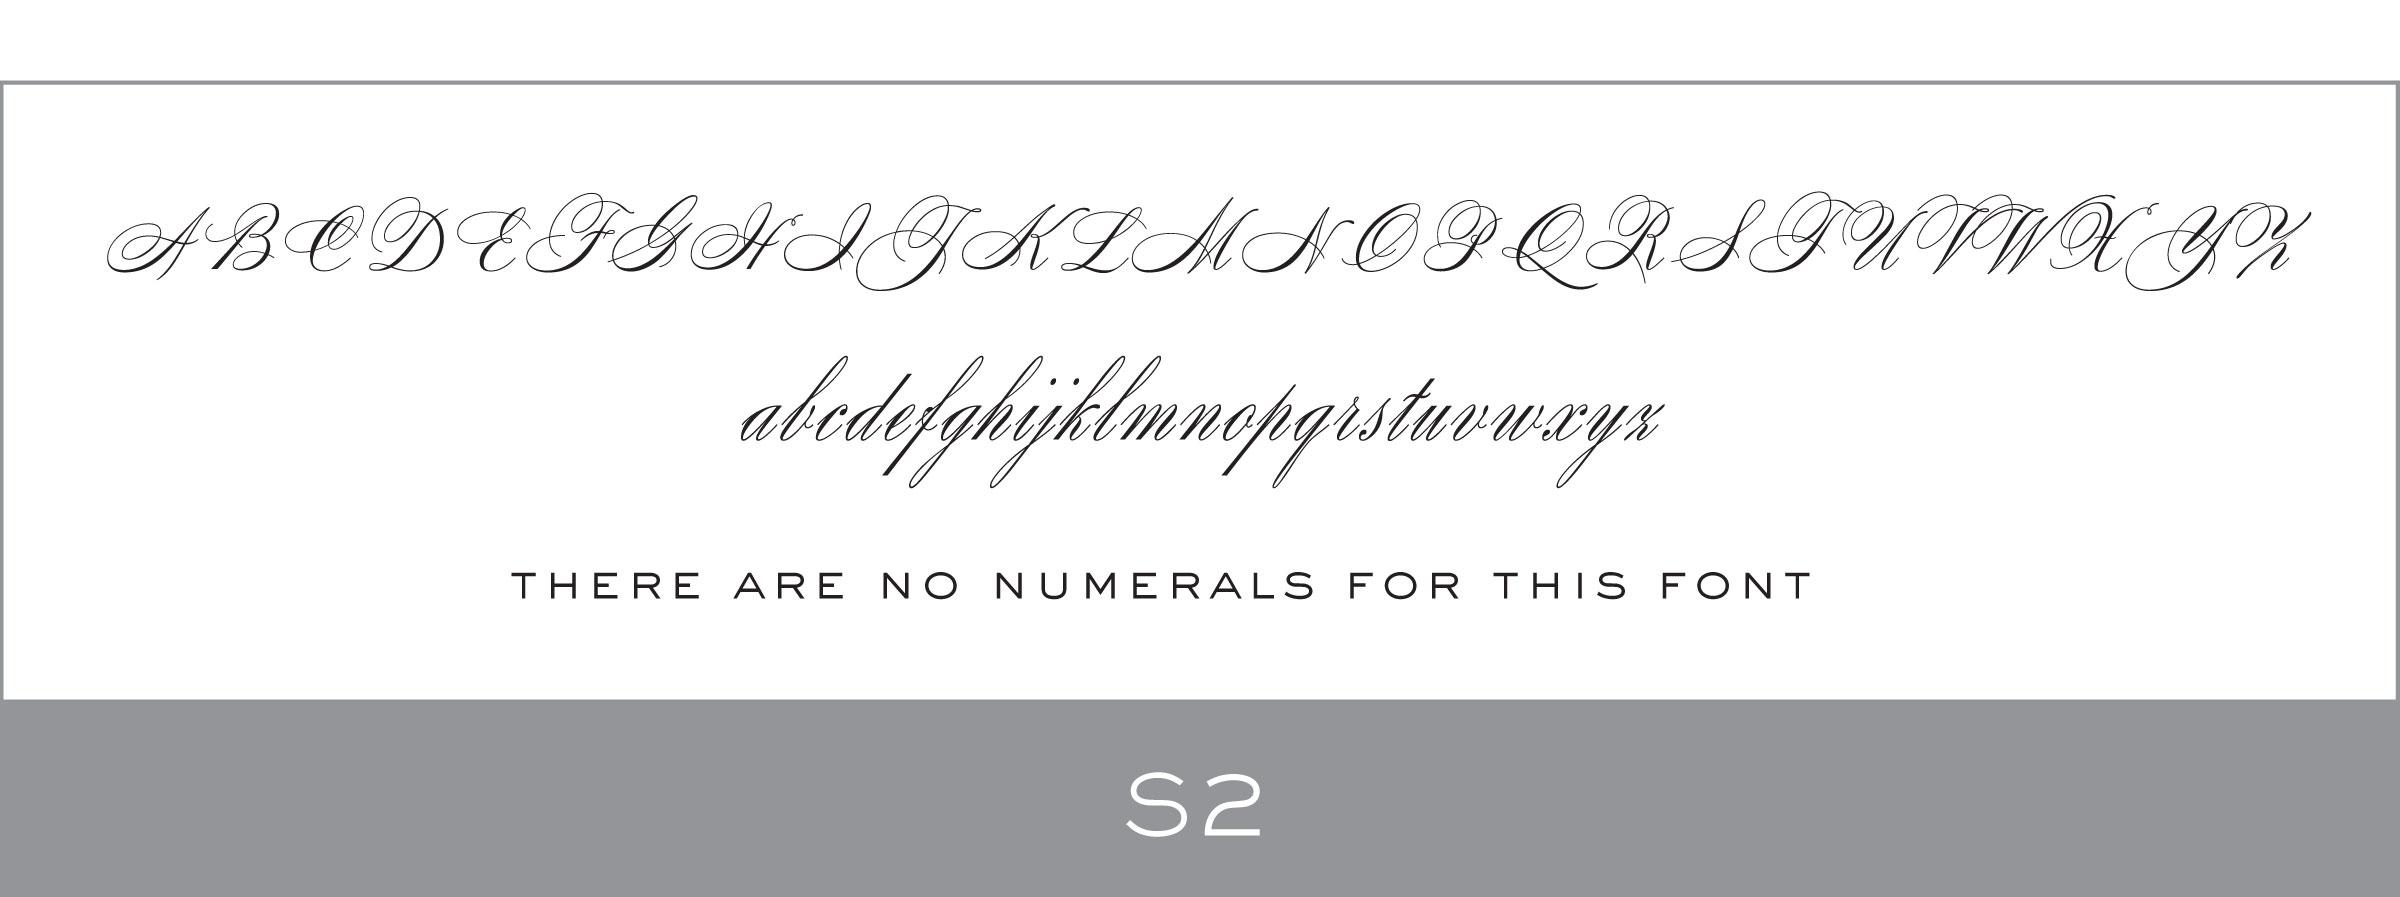 S2_Haute_Papier_Font.jpg